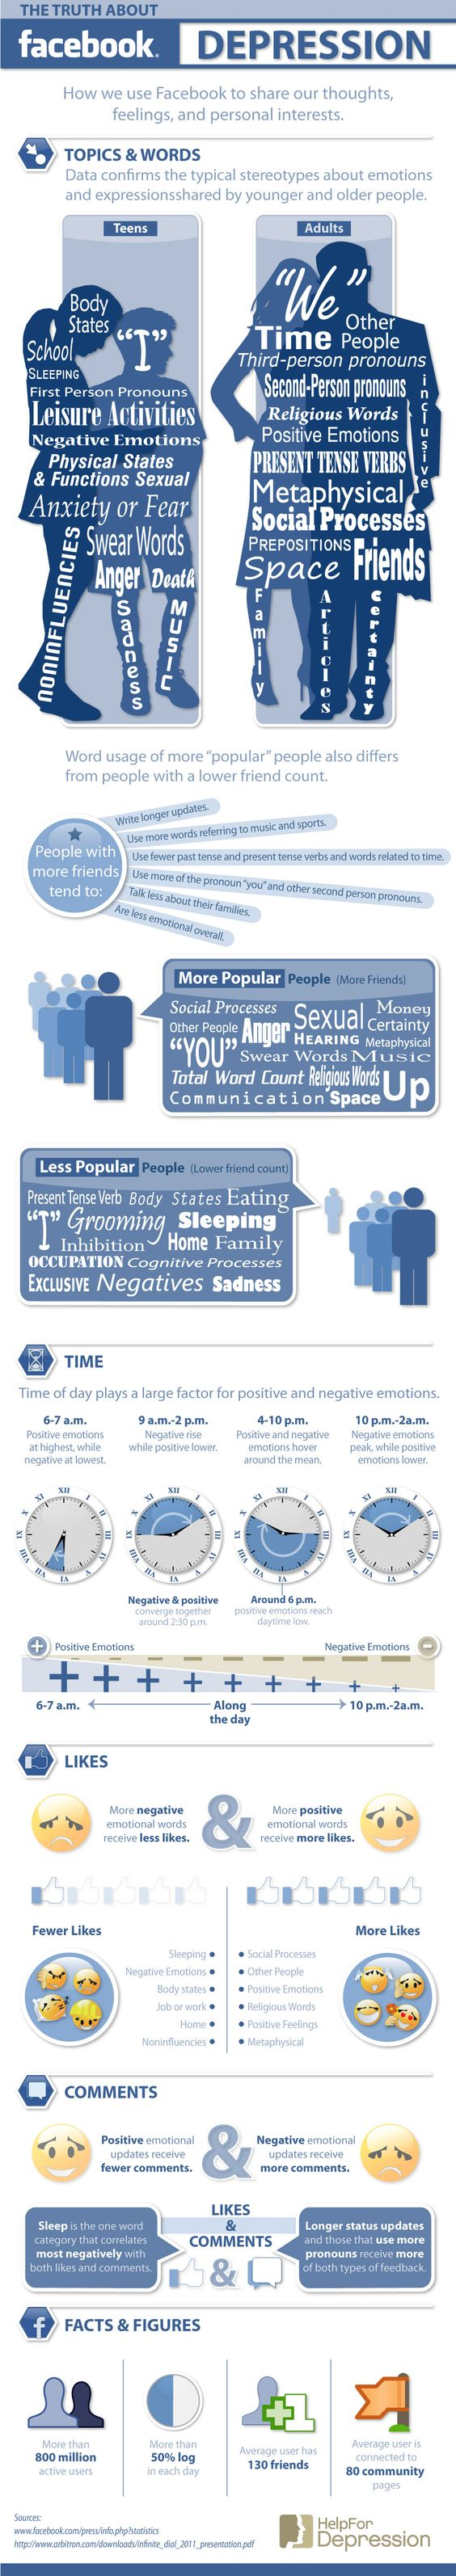 Positive Facebook Updates Get More Likes, Negative Get More Comments